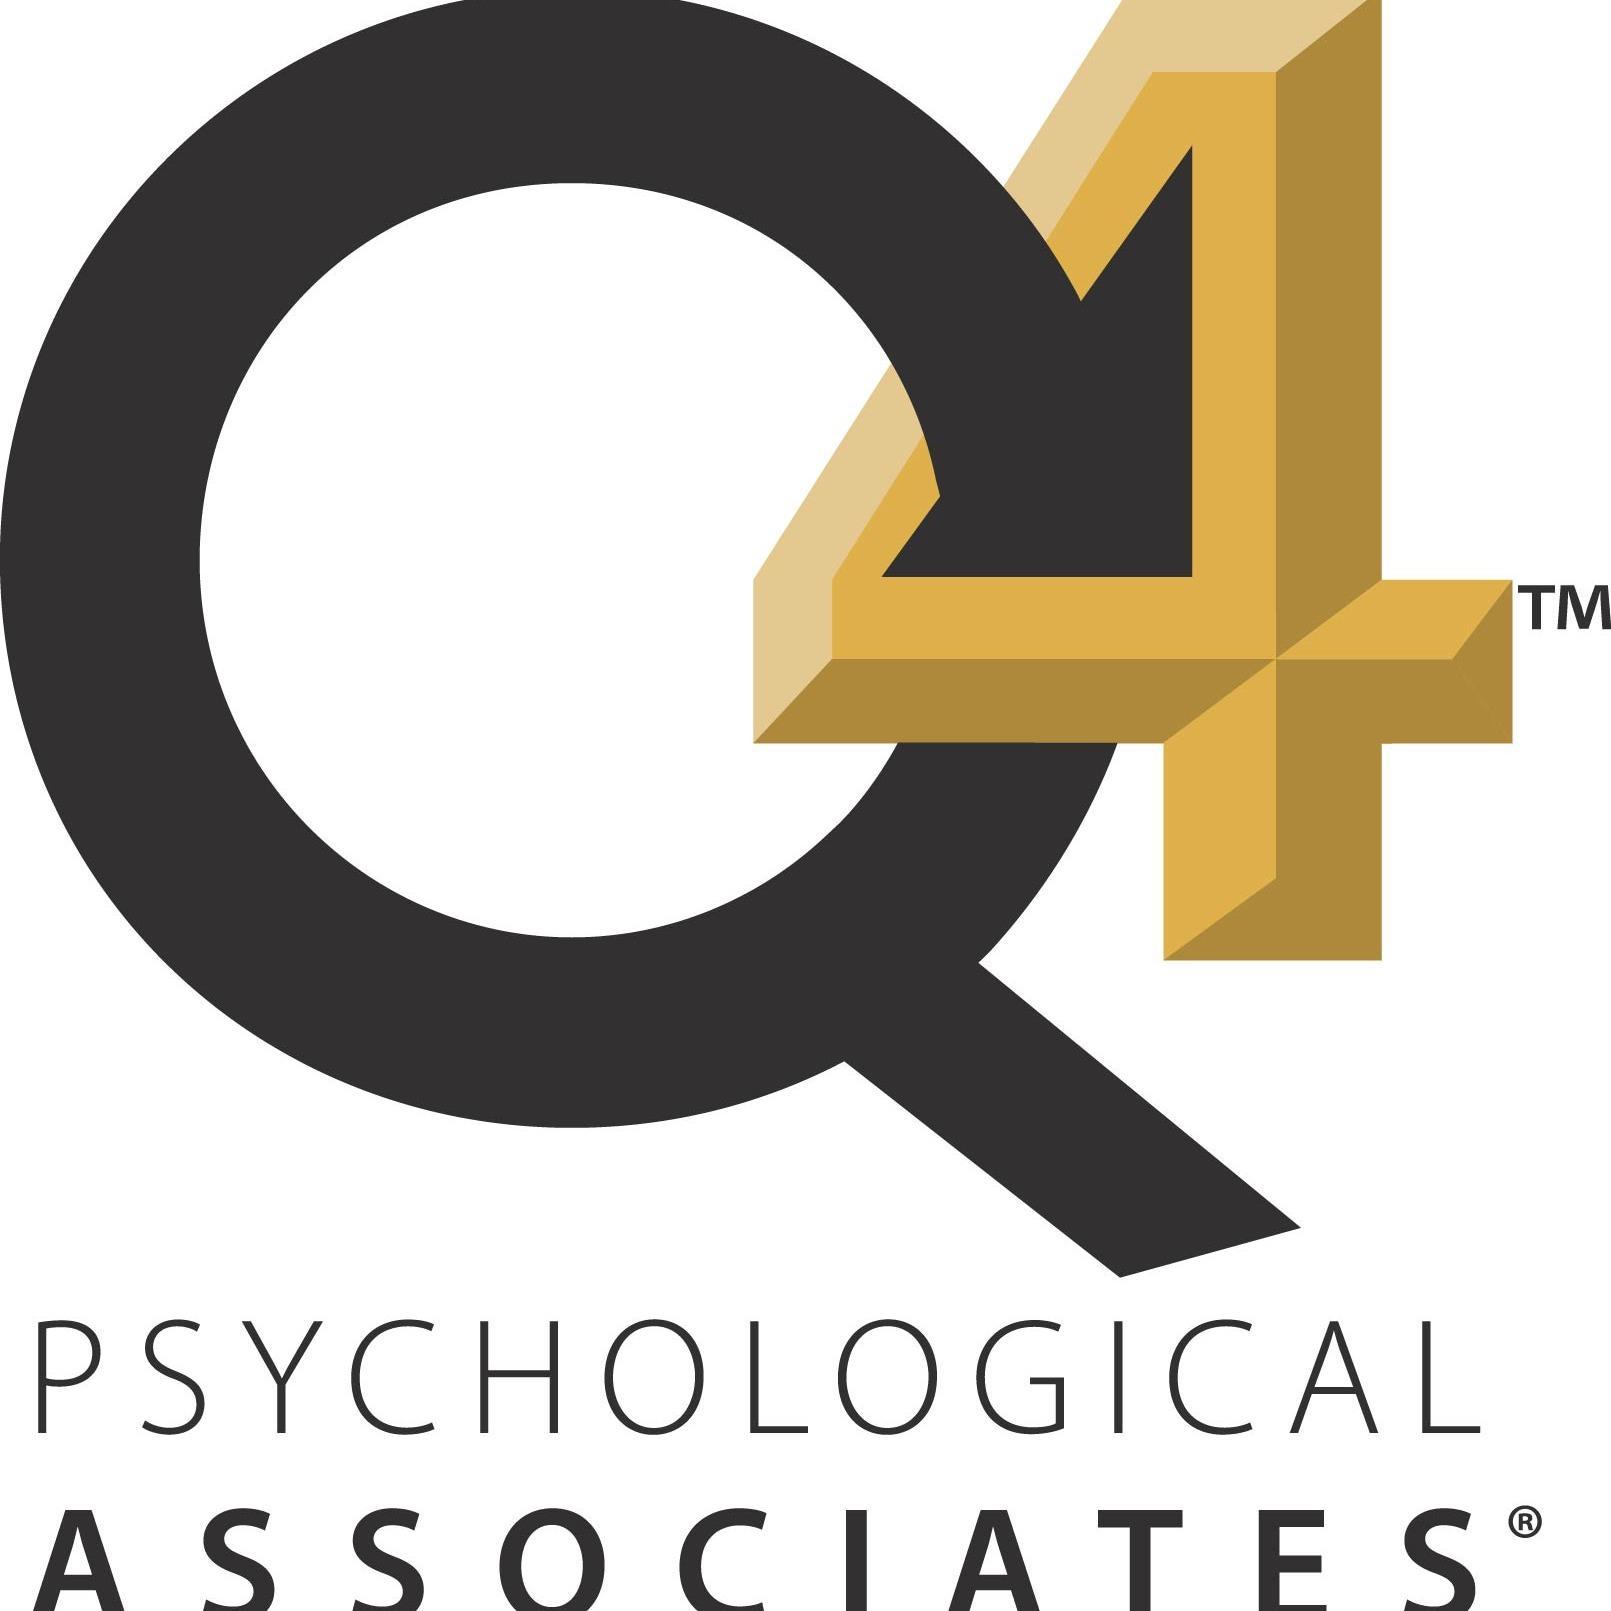 Psychological Associates